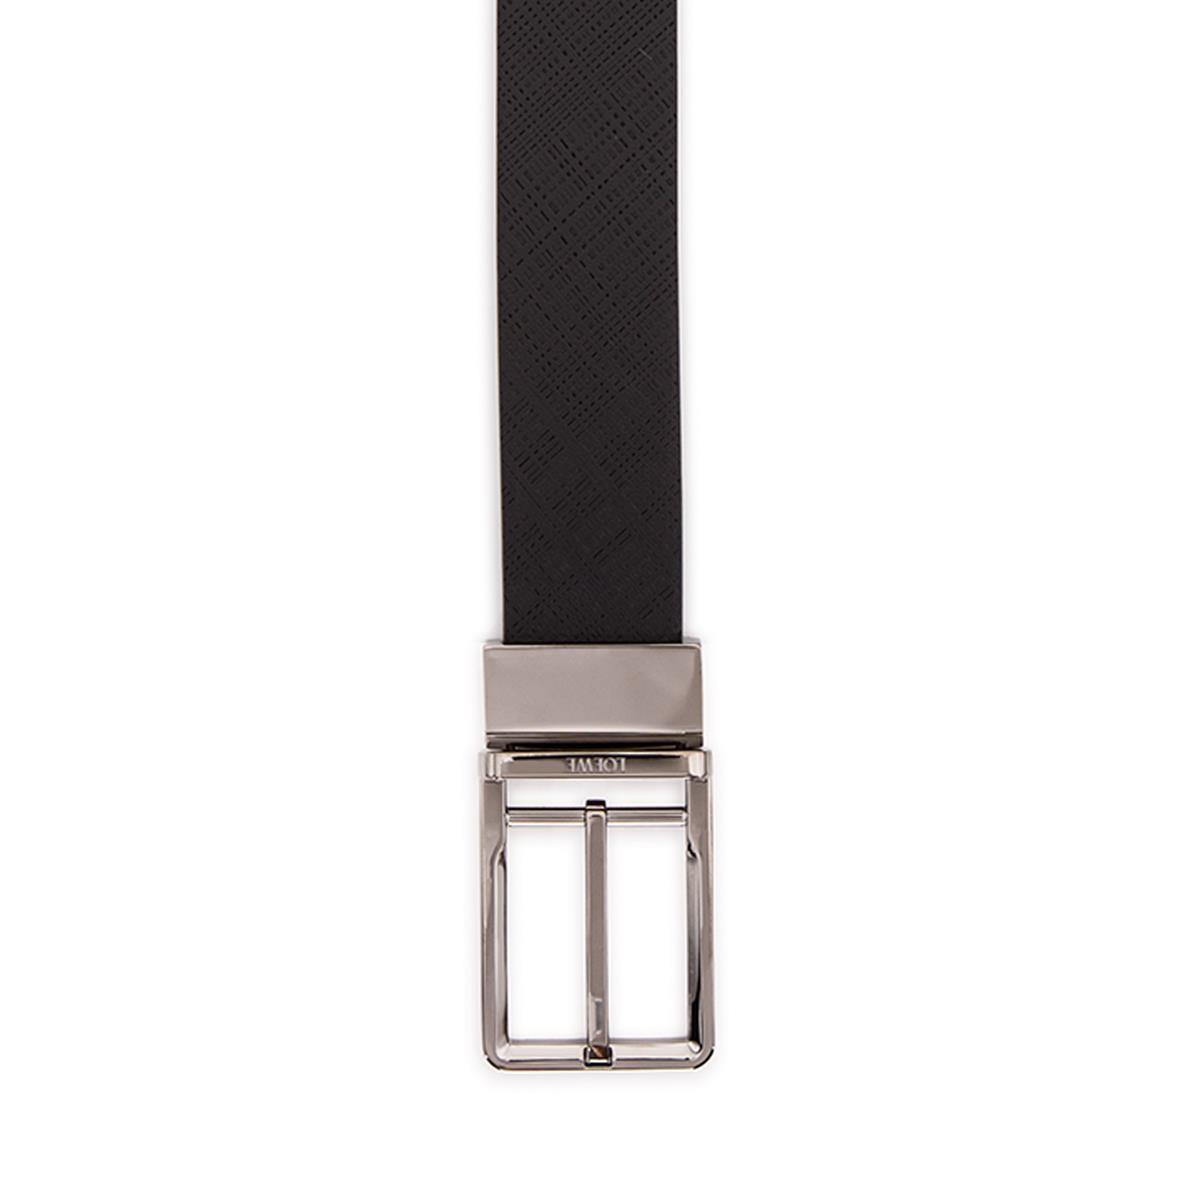 LOEWE Cinturon  Formal 3.2Cm Adj/Rev Negro/Rutenio front